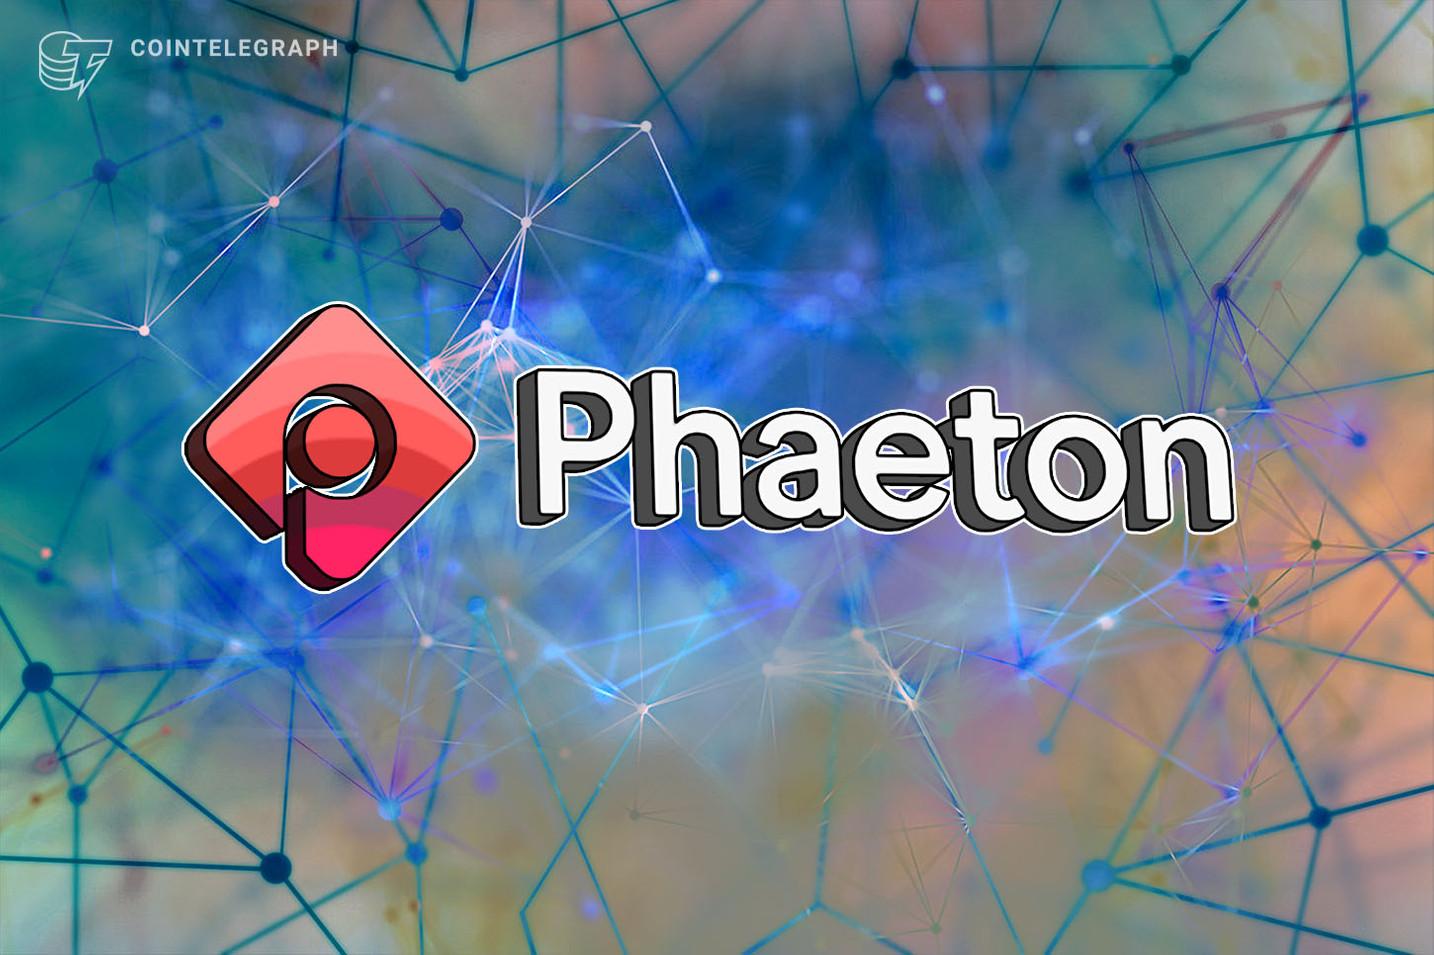 Phaeton 宣布推出首个可再生能源驱动的区块链网络